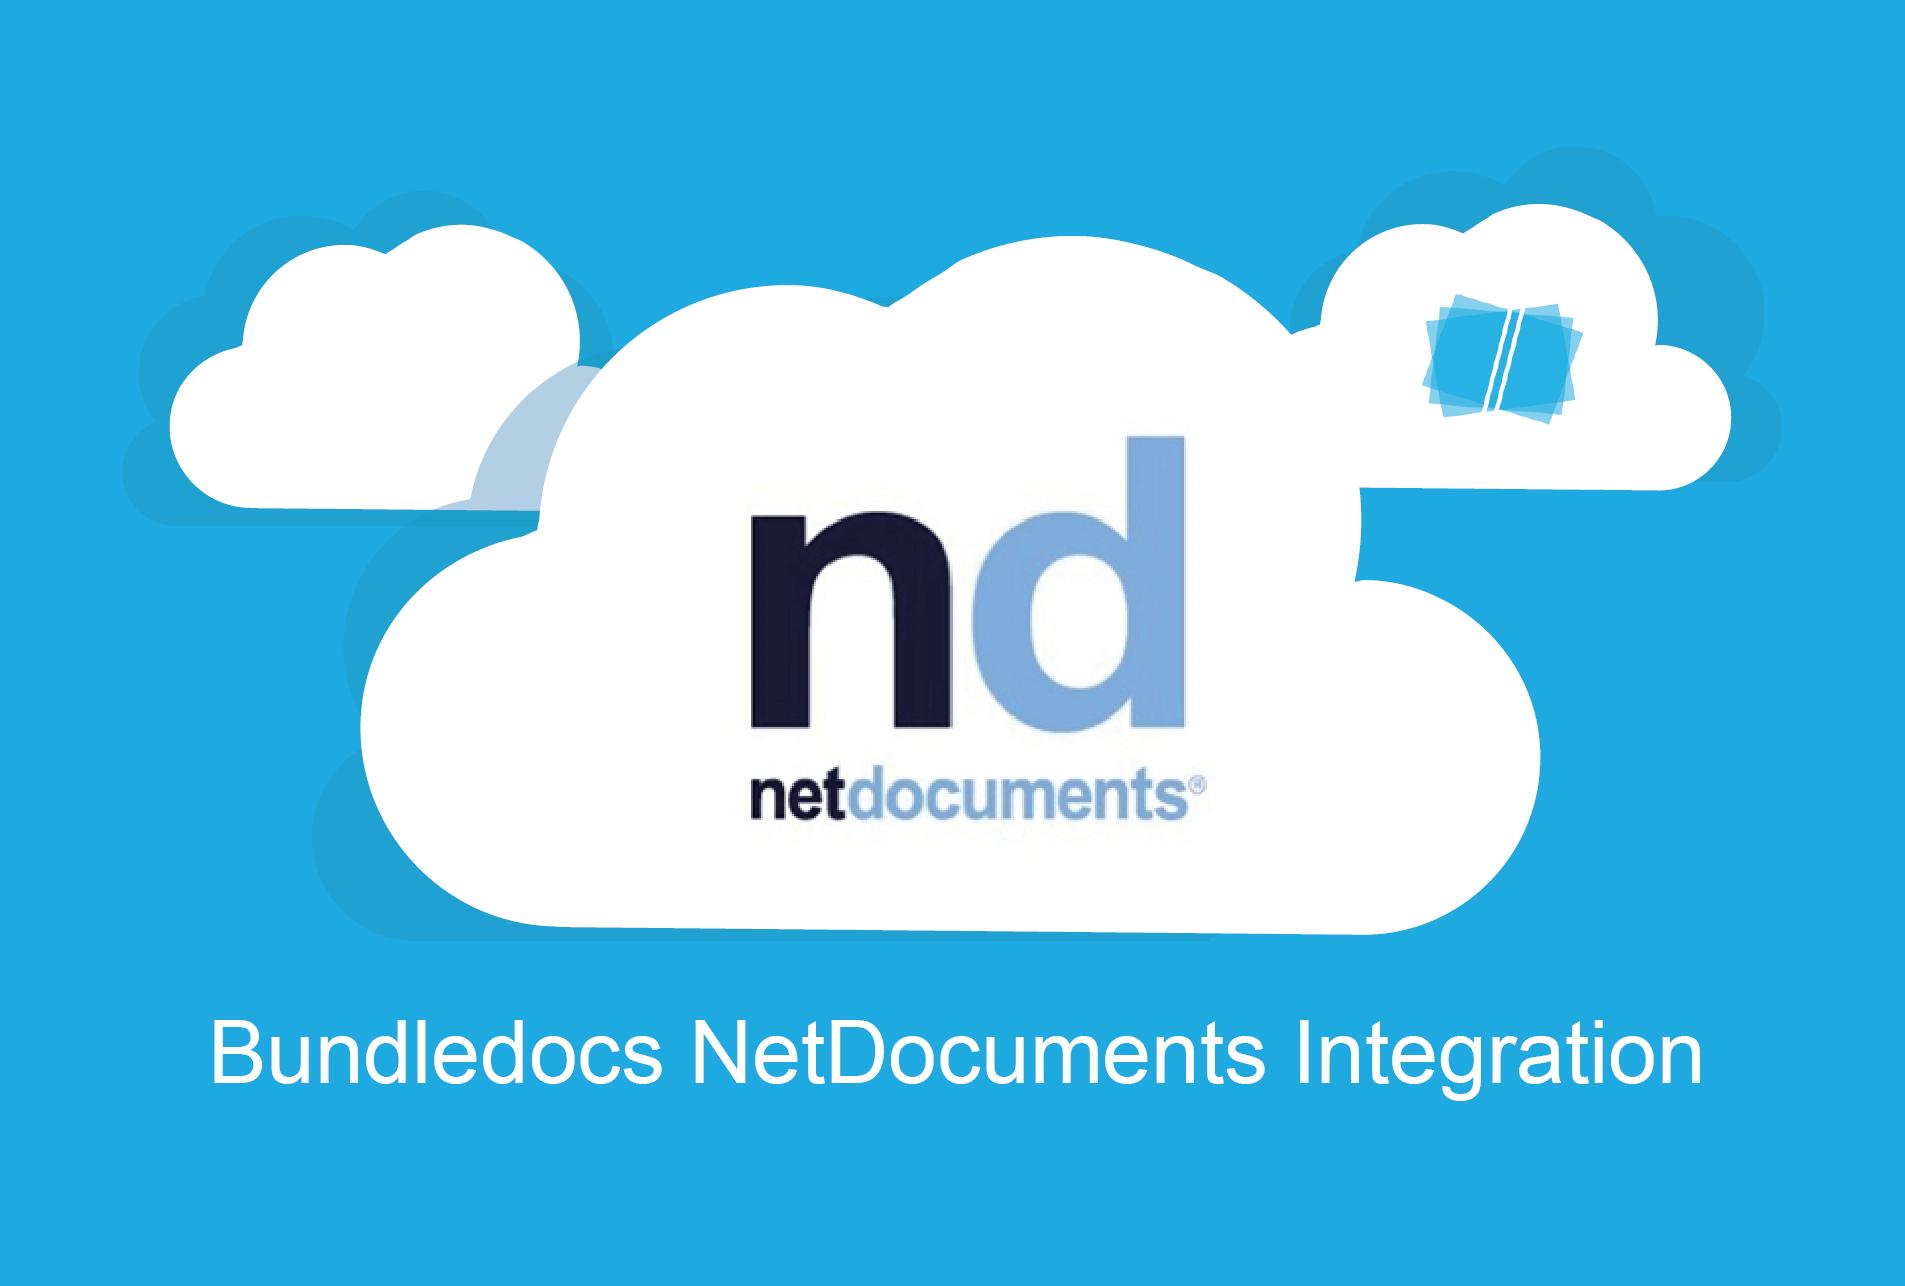 Bundledocs_NetDocuments_Integration_Announcement_2017.png